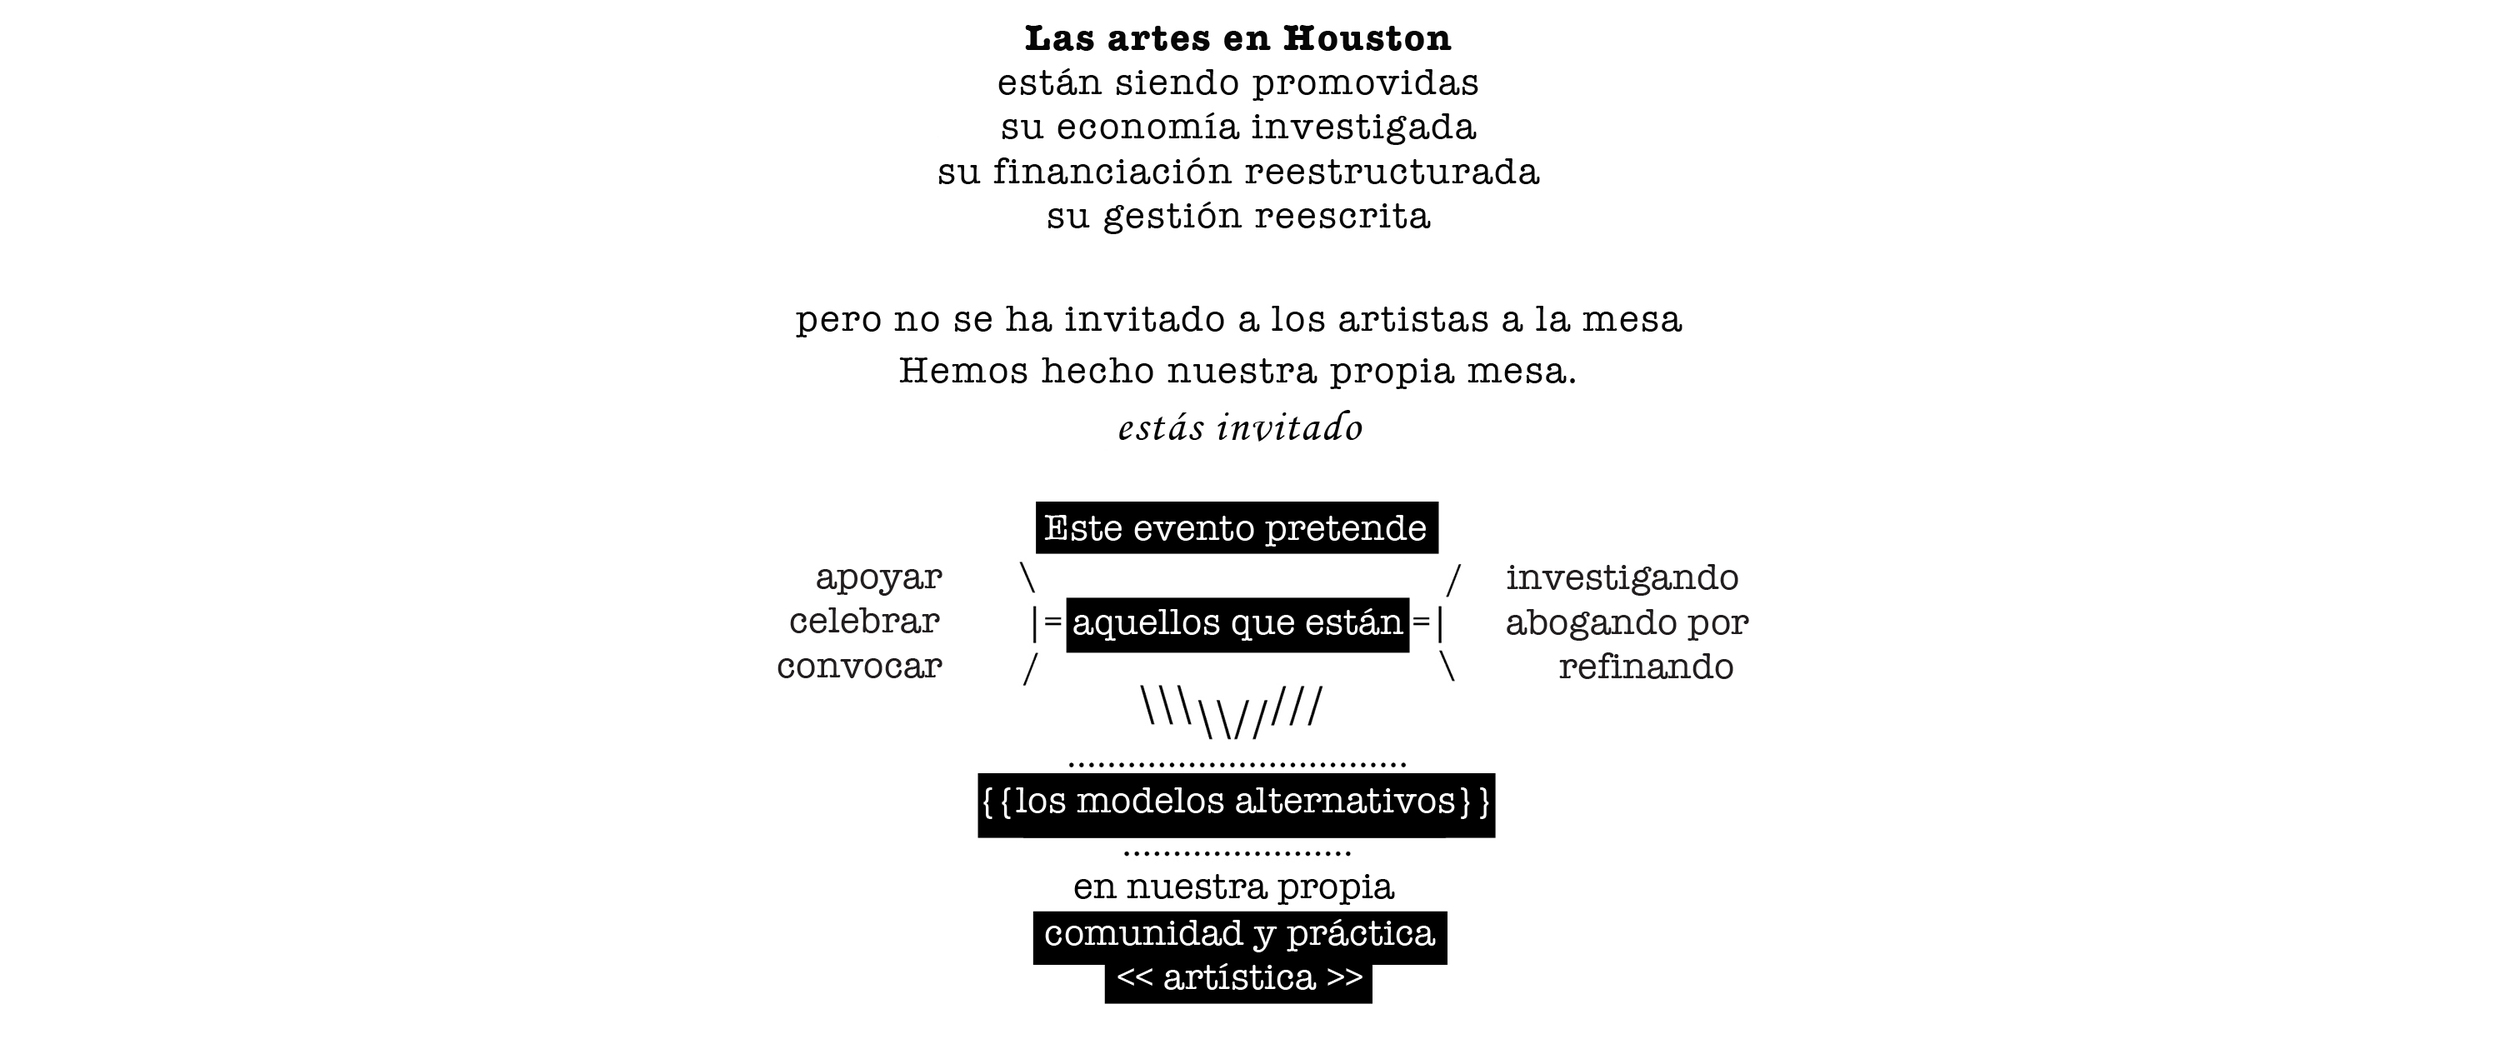 charge-description-web-wide-spanish.jpg